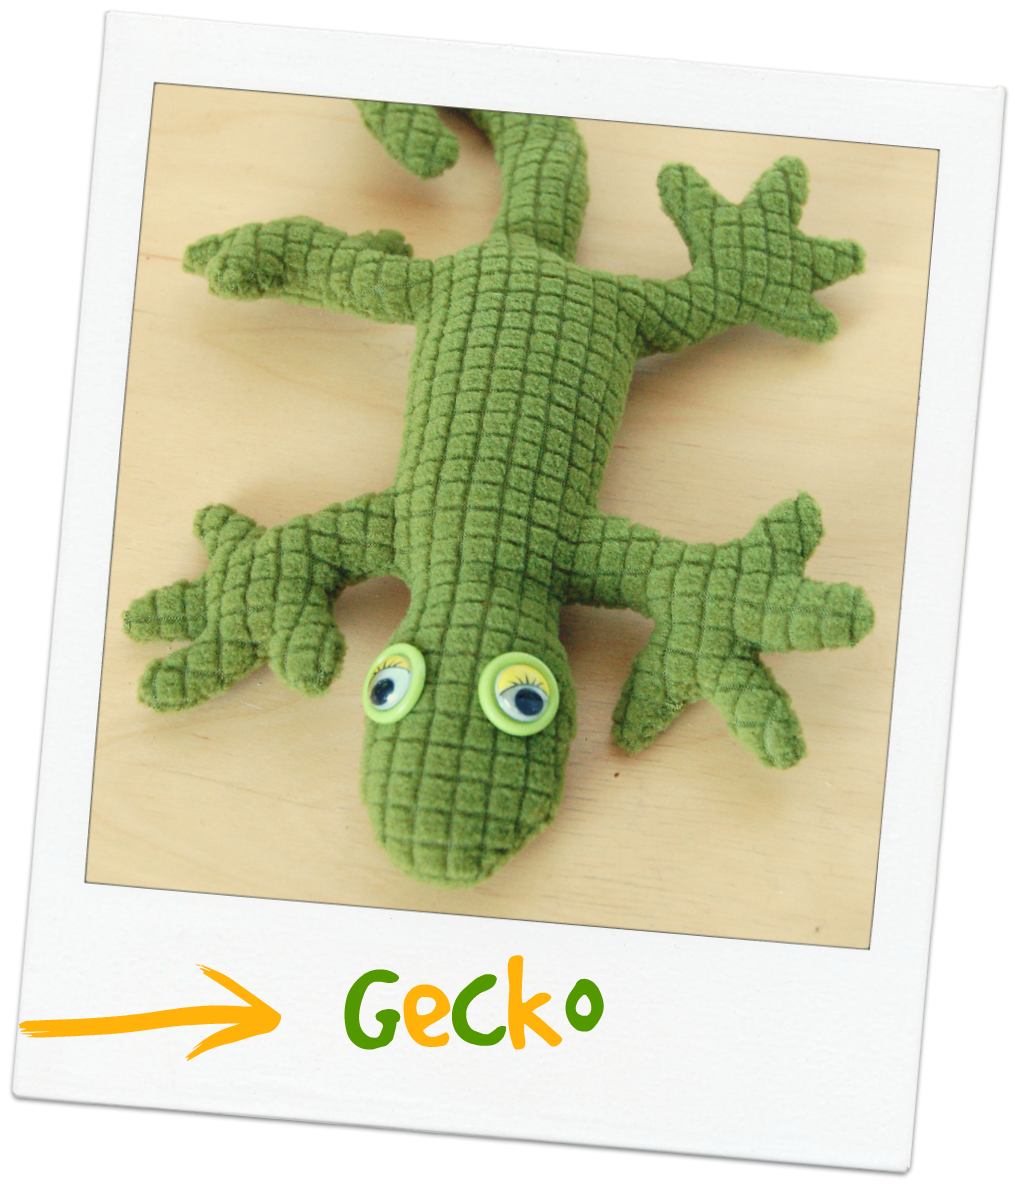 Gecko Stoffreste DIY Nähen Reptilien Reptil Stofftier Kuscheltier ...